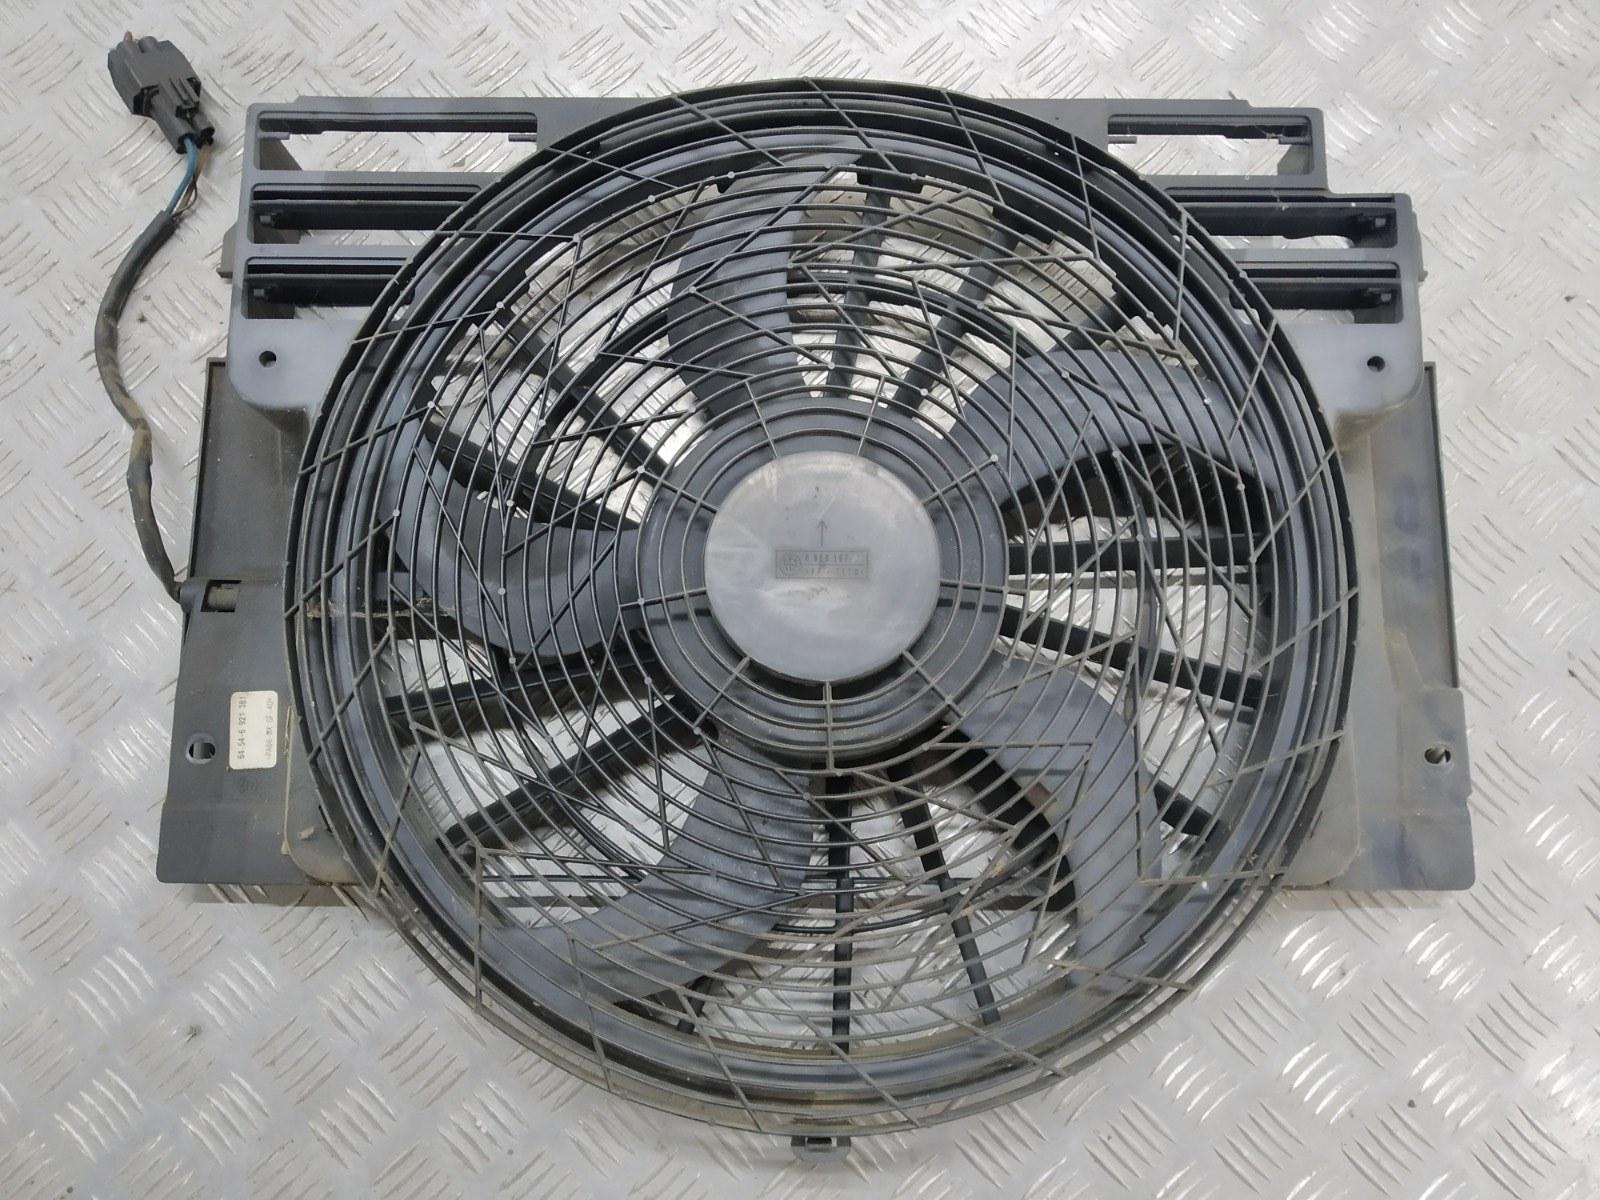 Вентилятор кондиционера Bmw X5 E53 4.4 I 2001 (б/у)